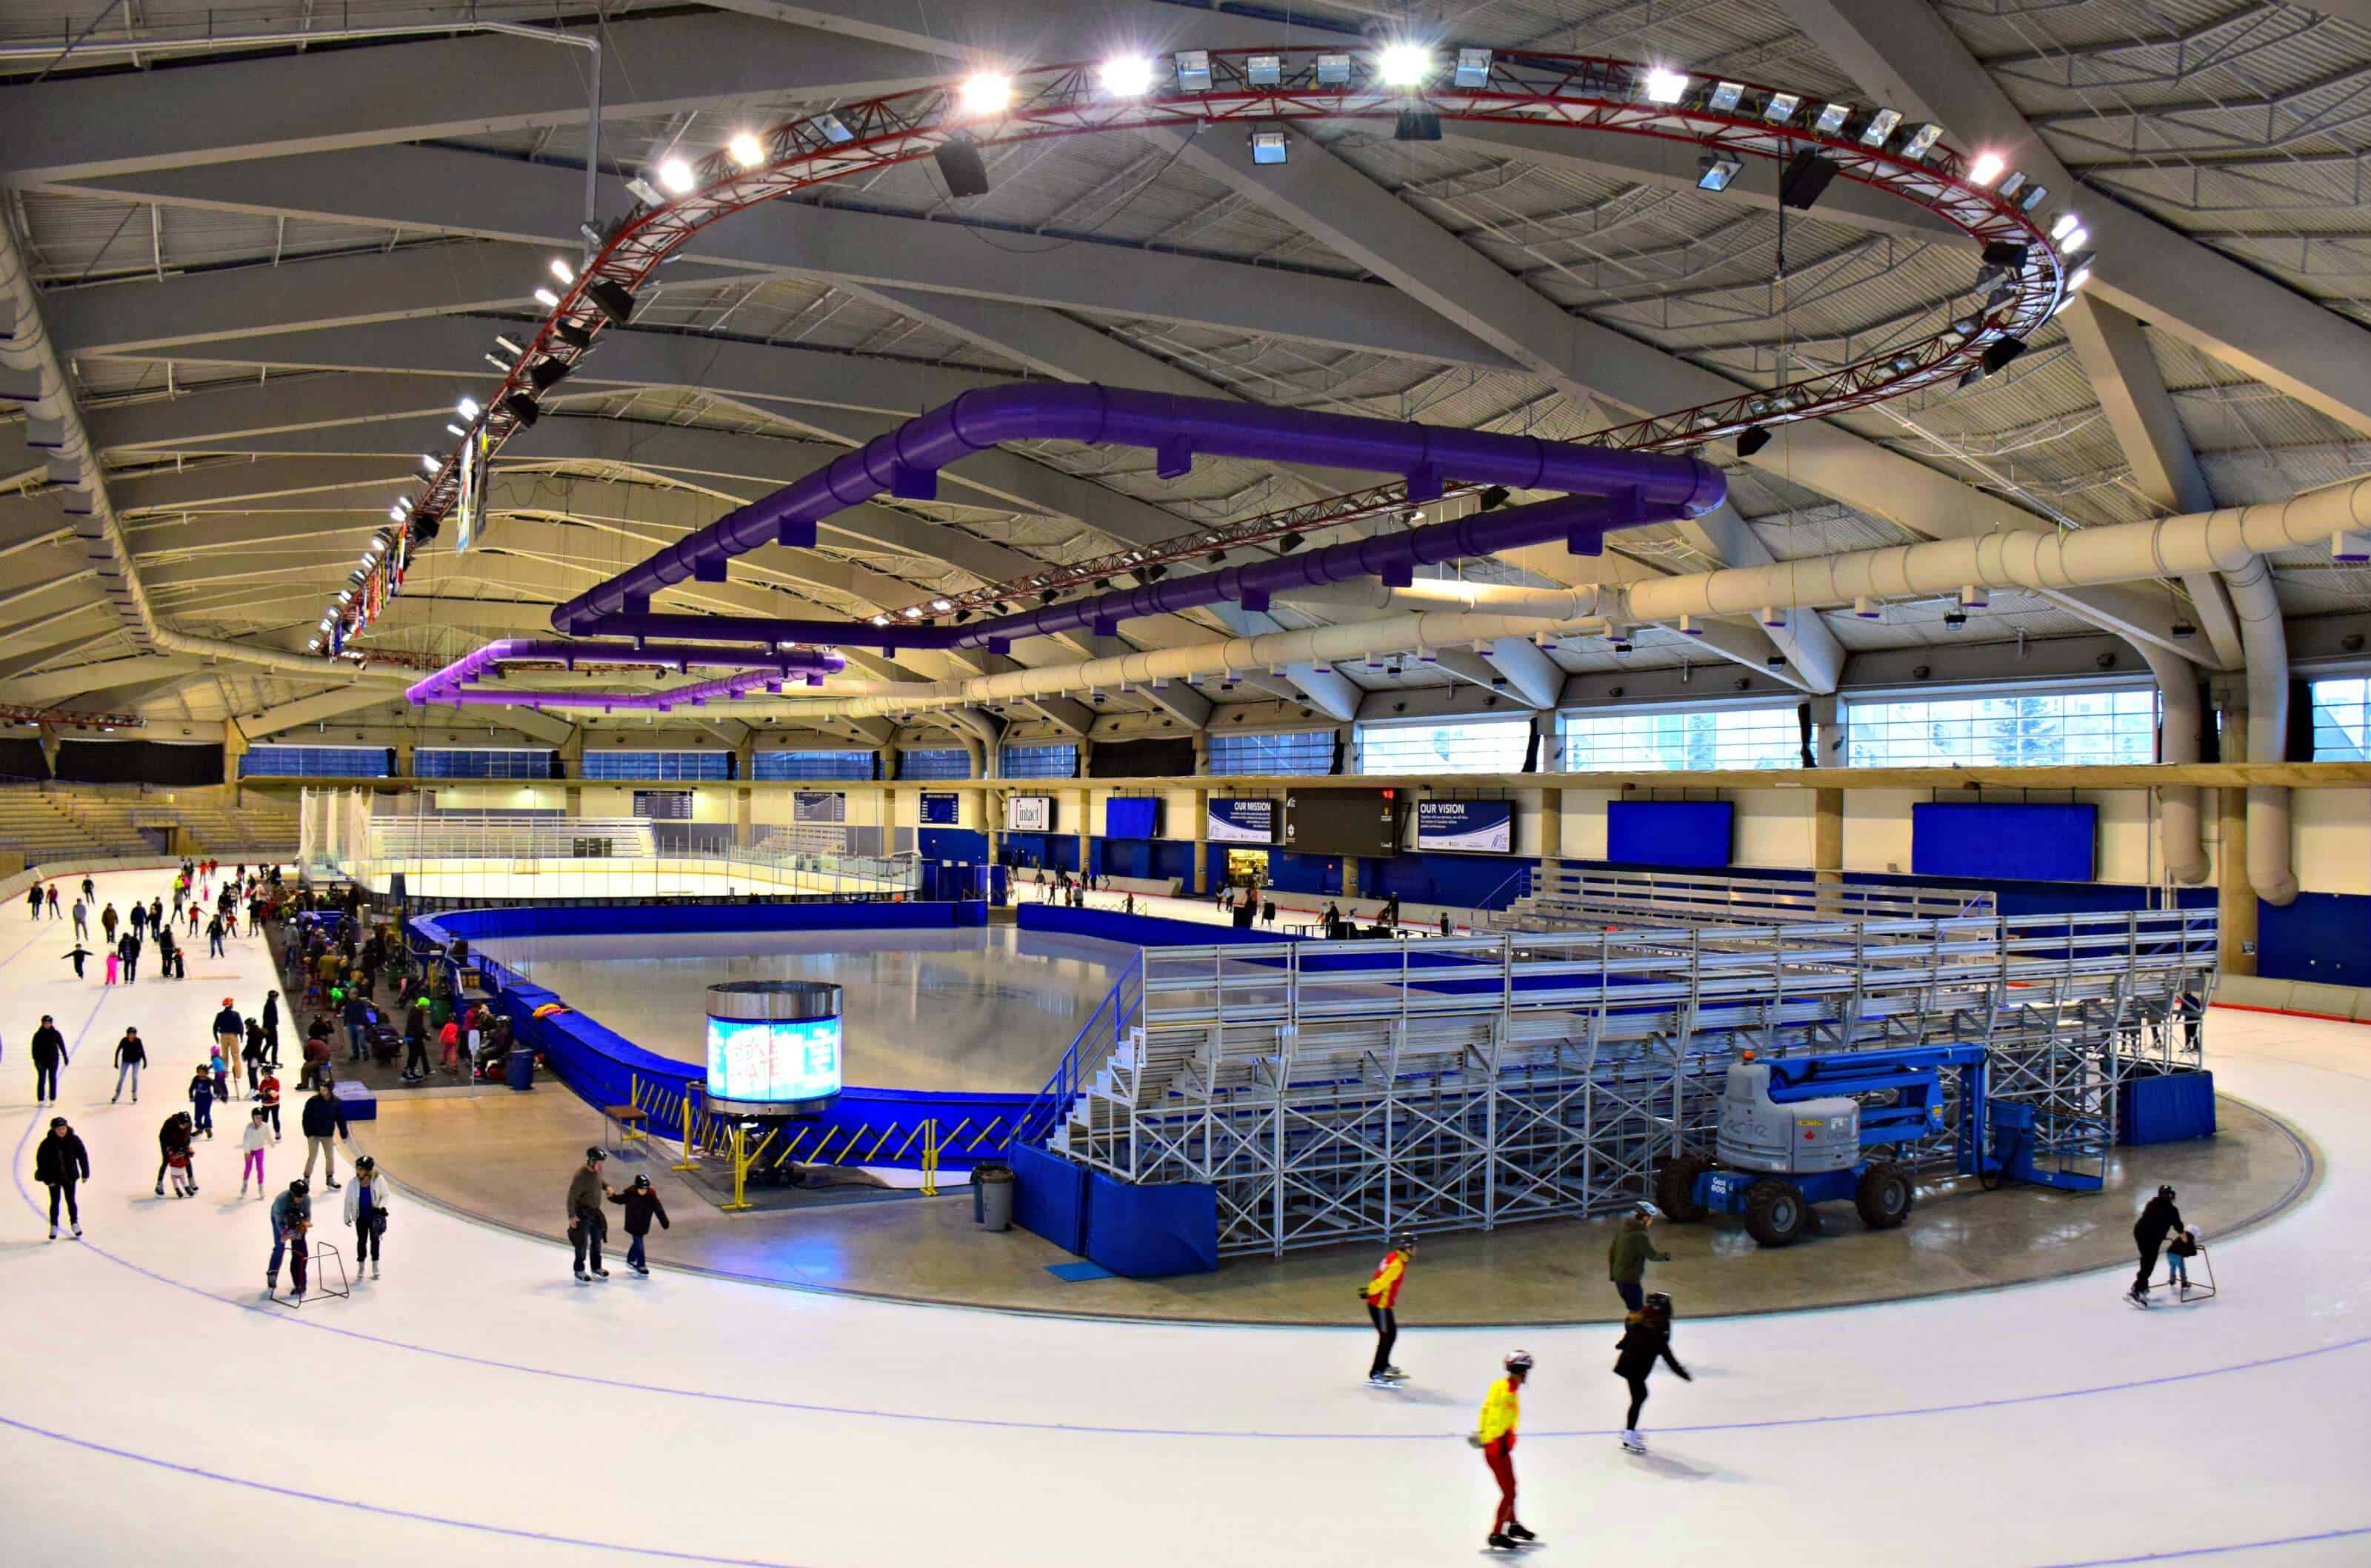 Olympic Oval, Calgary, Alberta, Canada